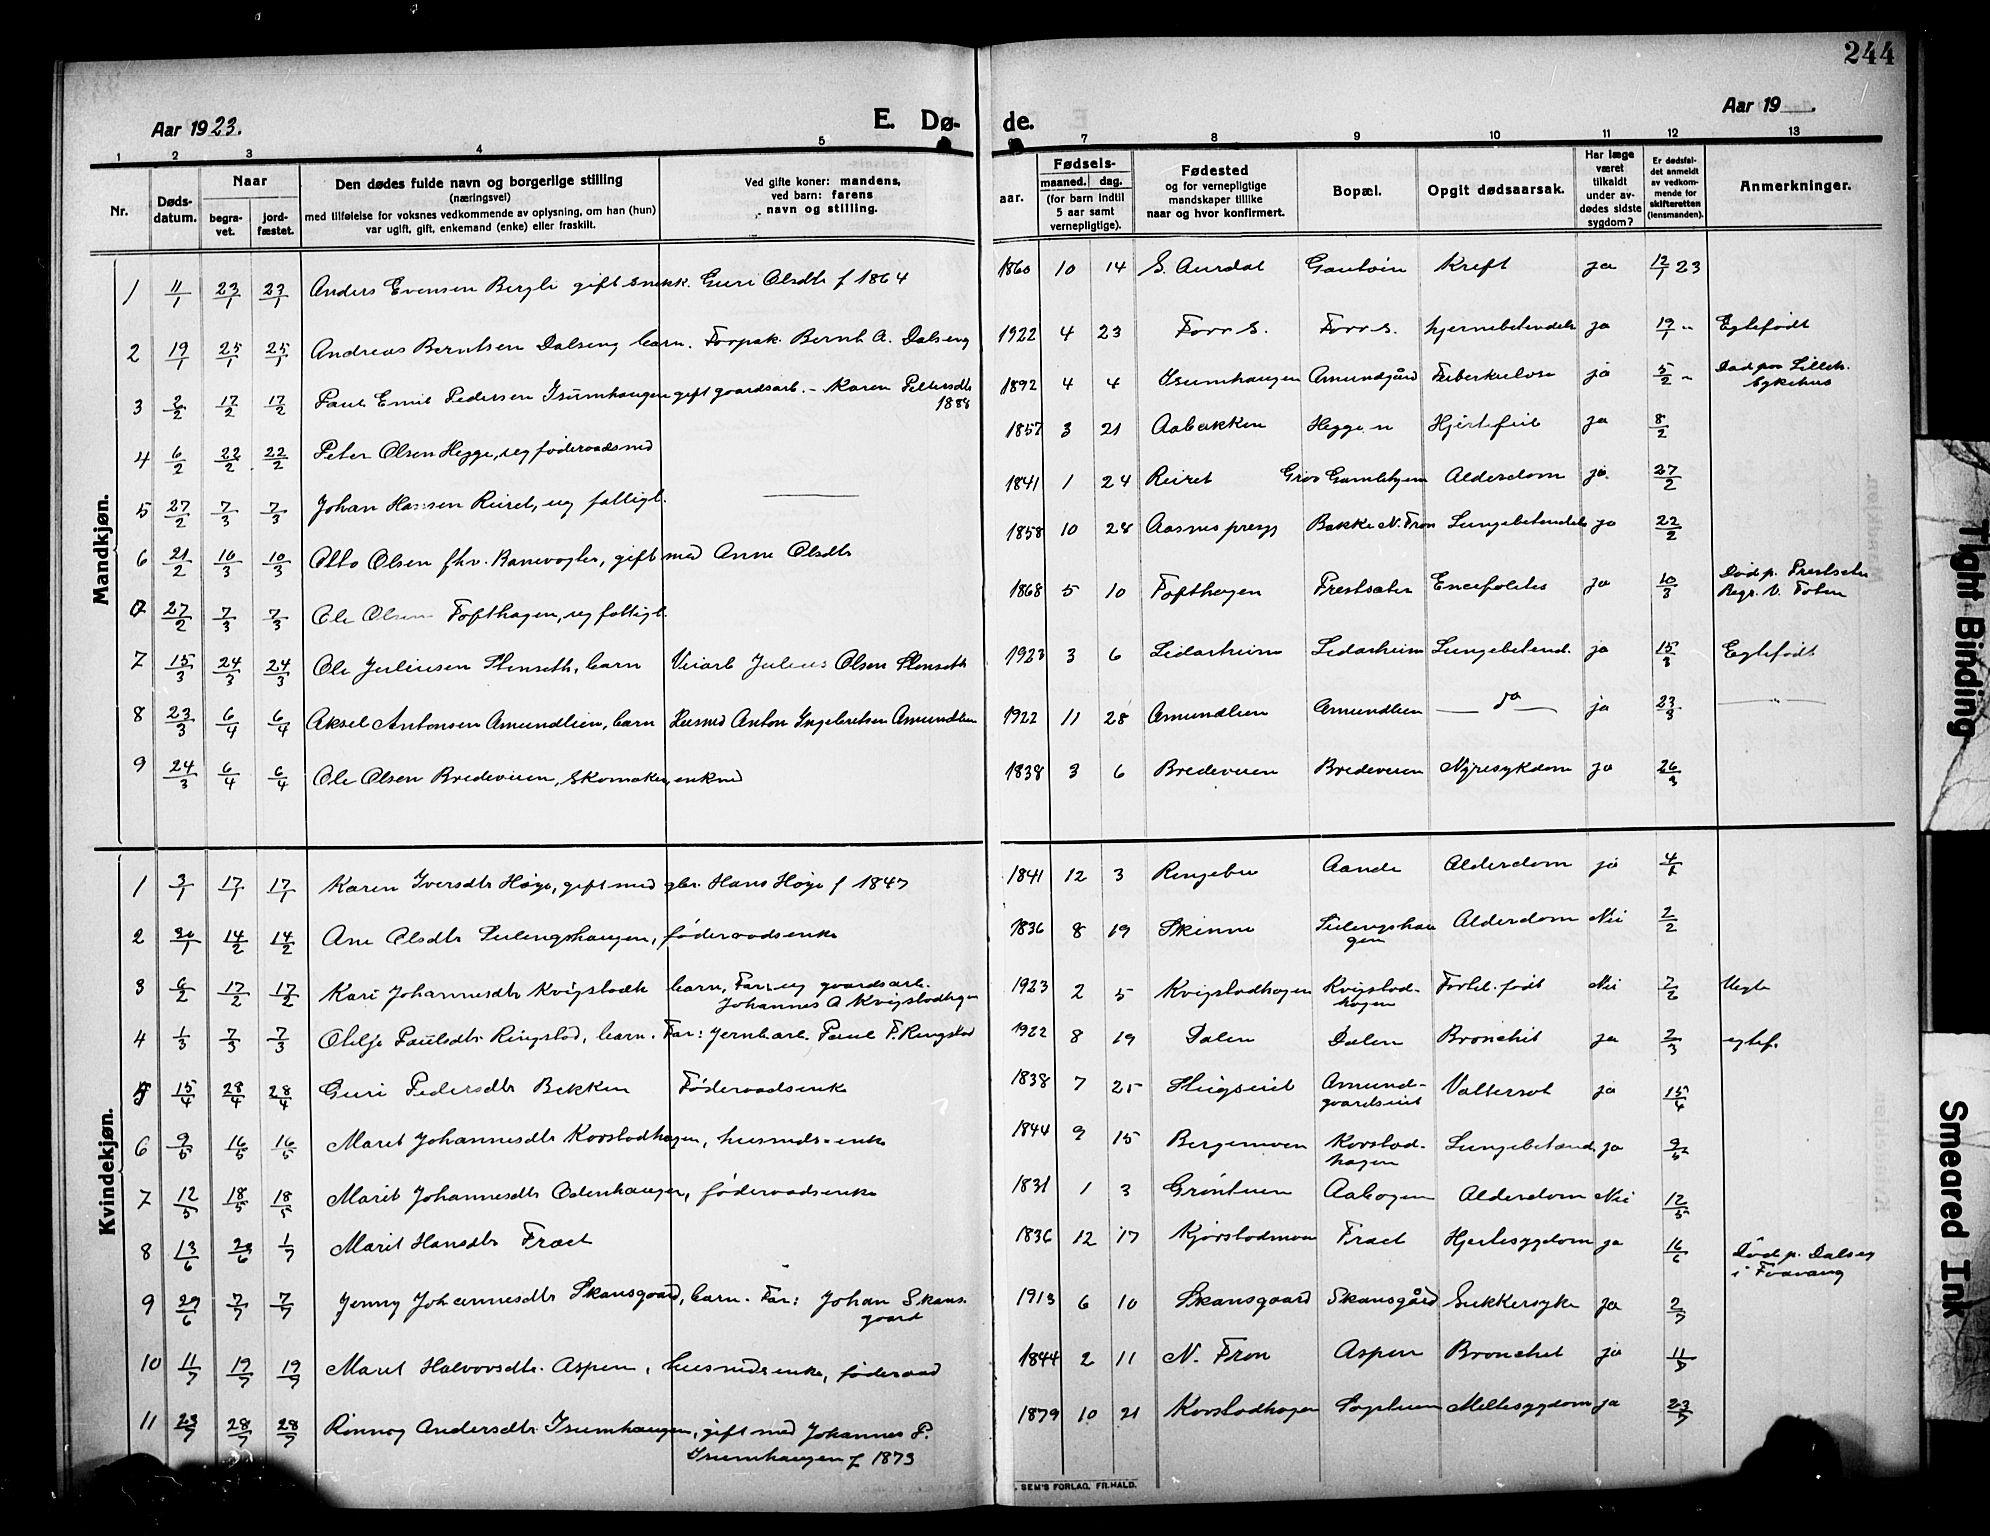 SAH, Sør-Fron prestekontor, H/Ha/Hab/L0005: Klokkerbok nr. 5, 1912-1930, s. 244